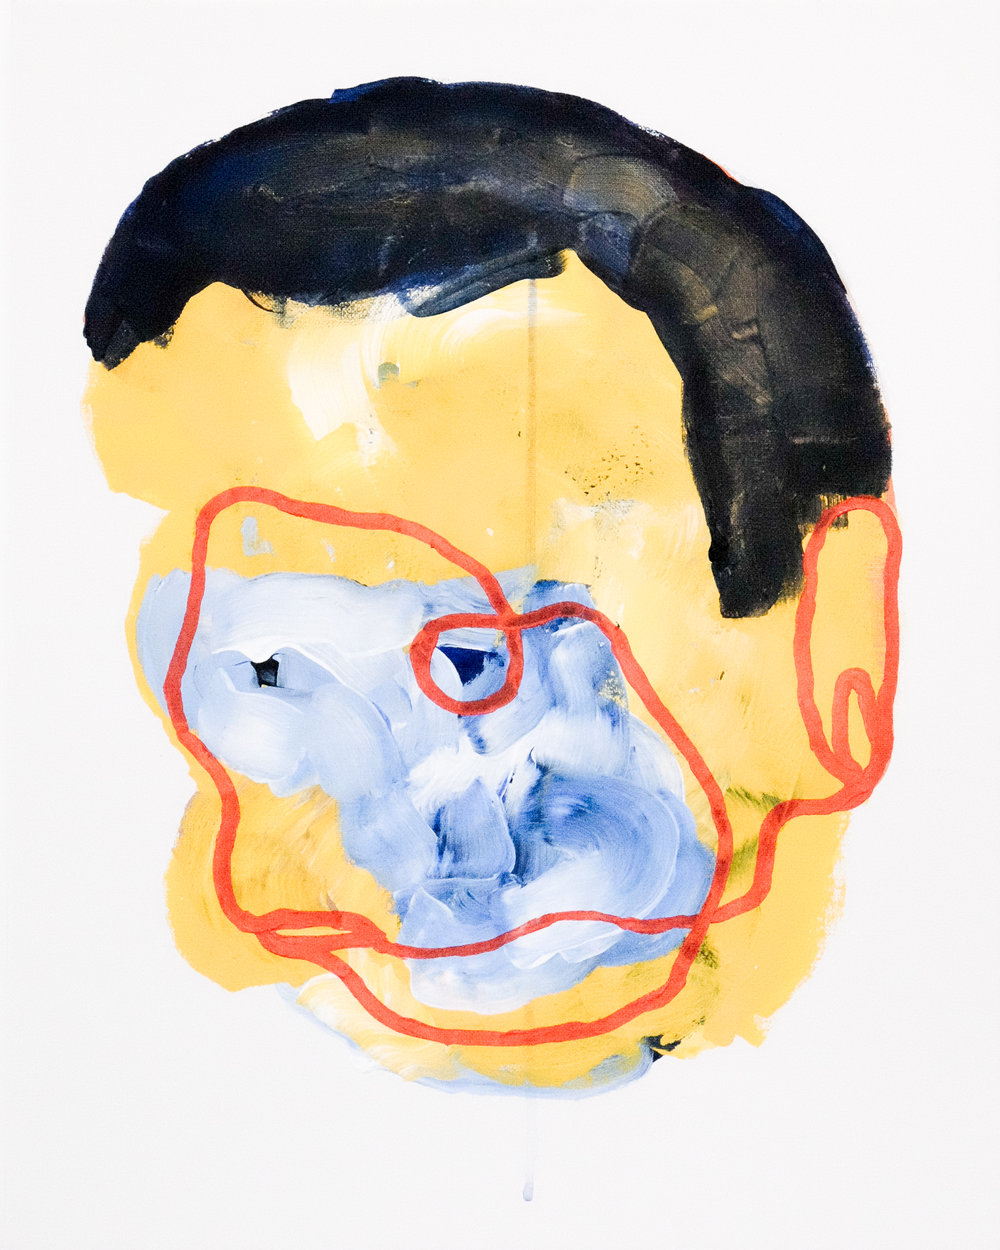 Self portrait no. 3,2017, acrylic on canvas, 405mm x 510mm.